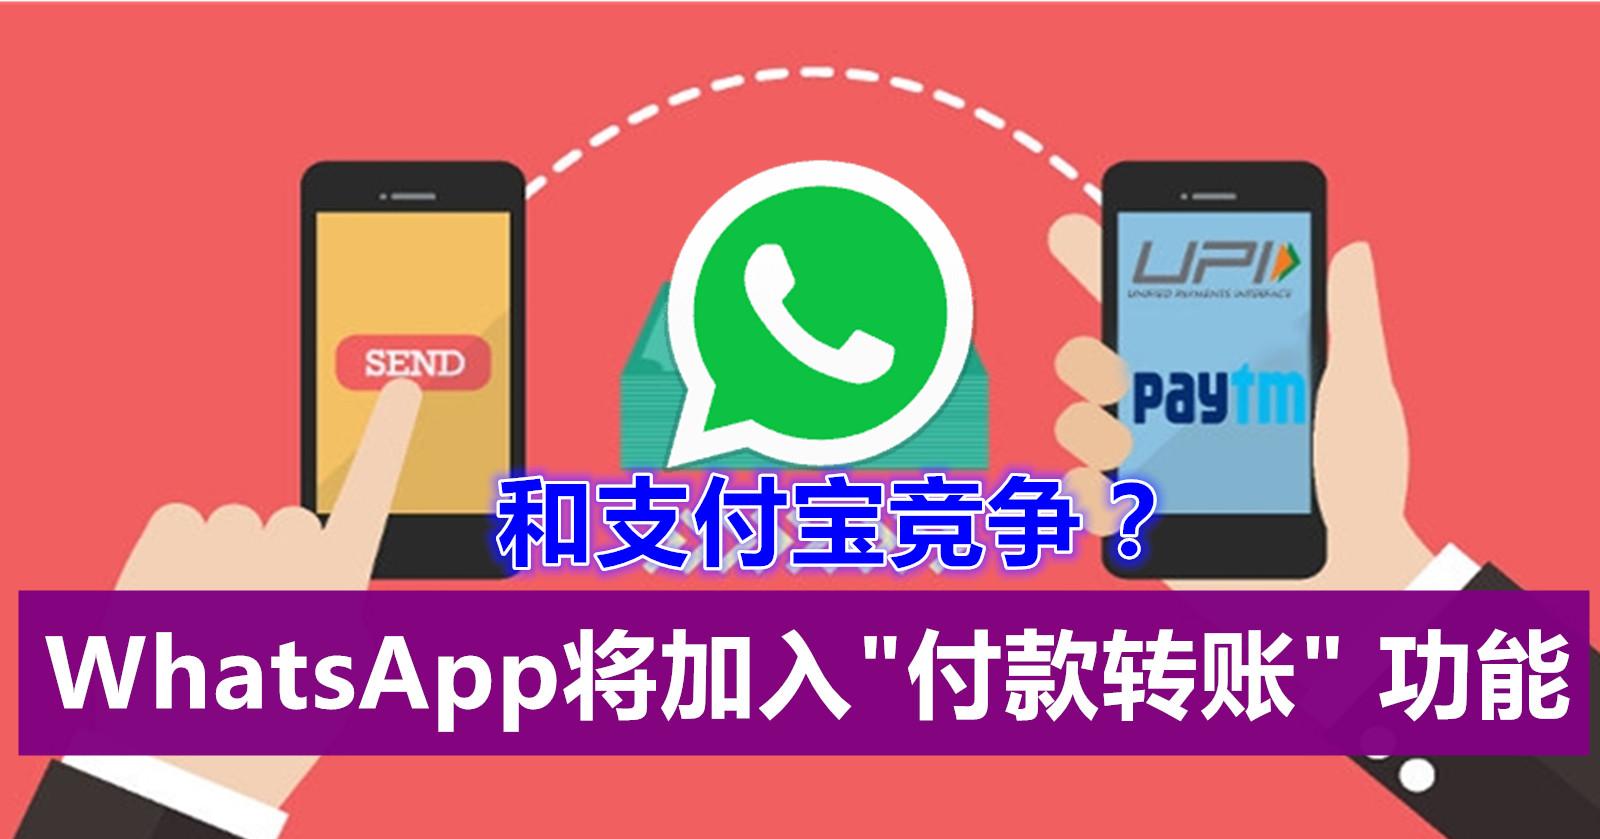 WhatsApp即將推出支付功能 | LC 小傢伙綜合網